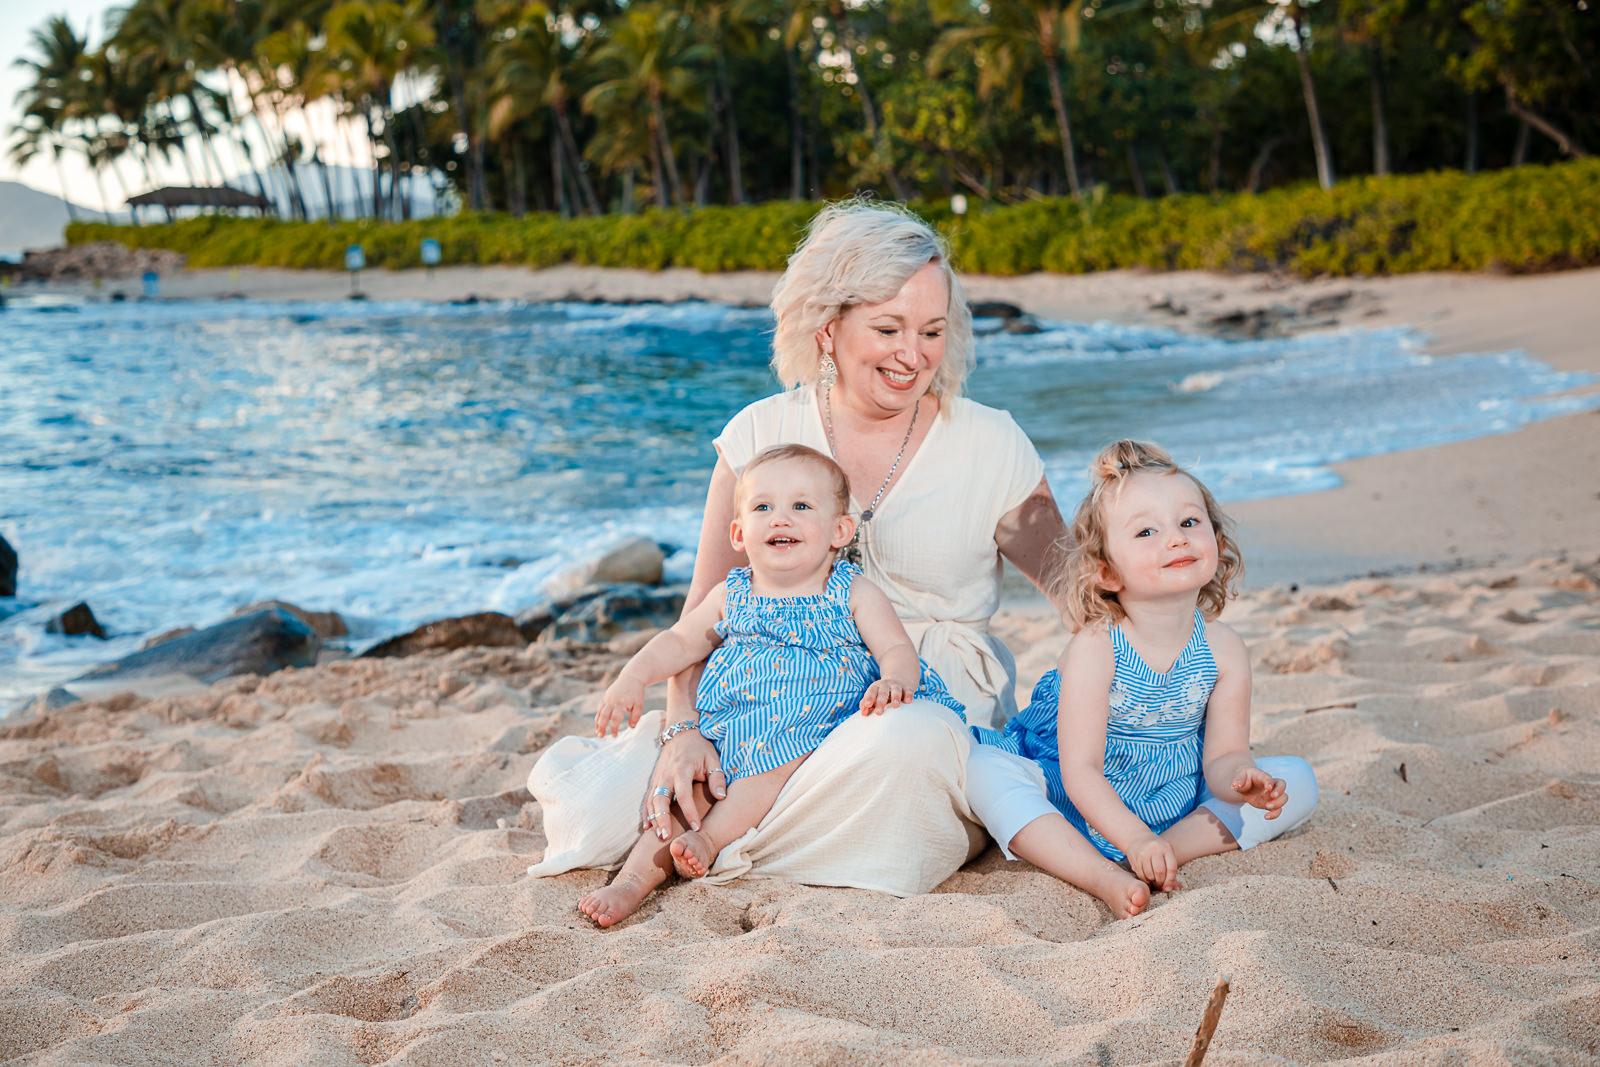 Oahu2019-9413.jpg